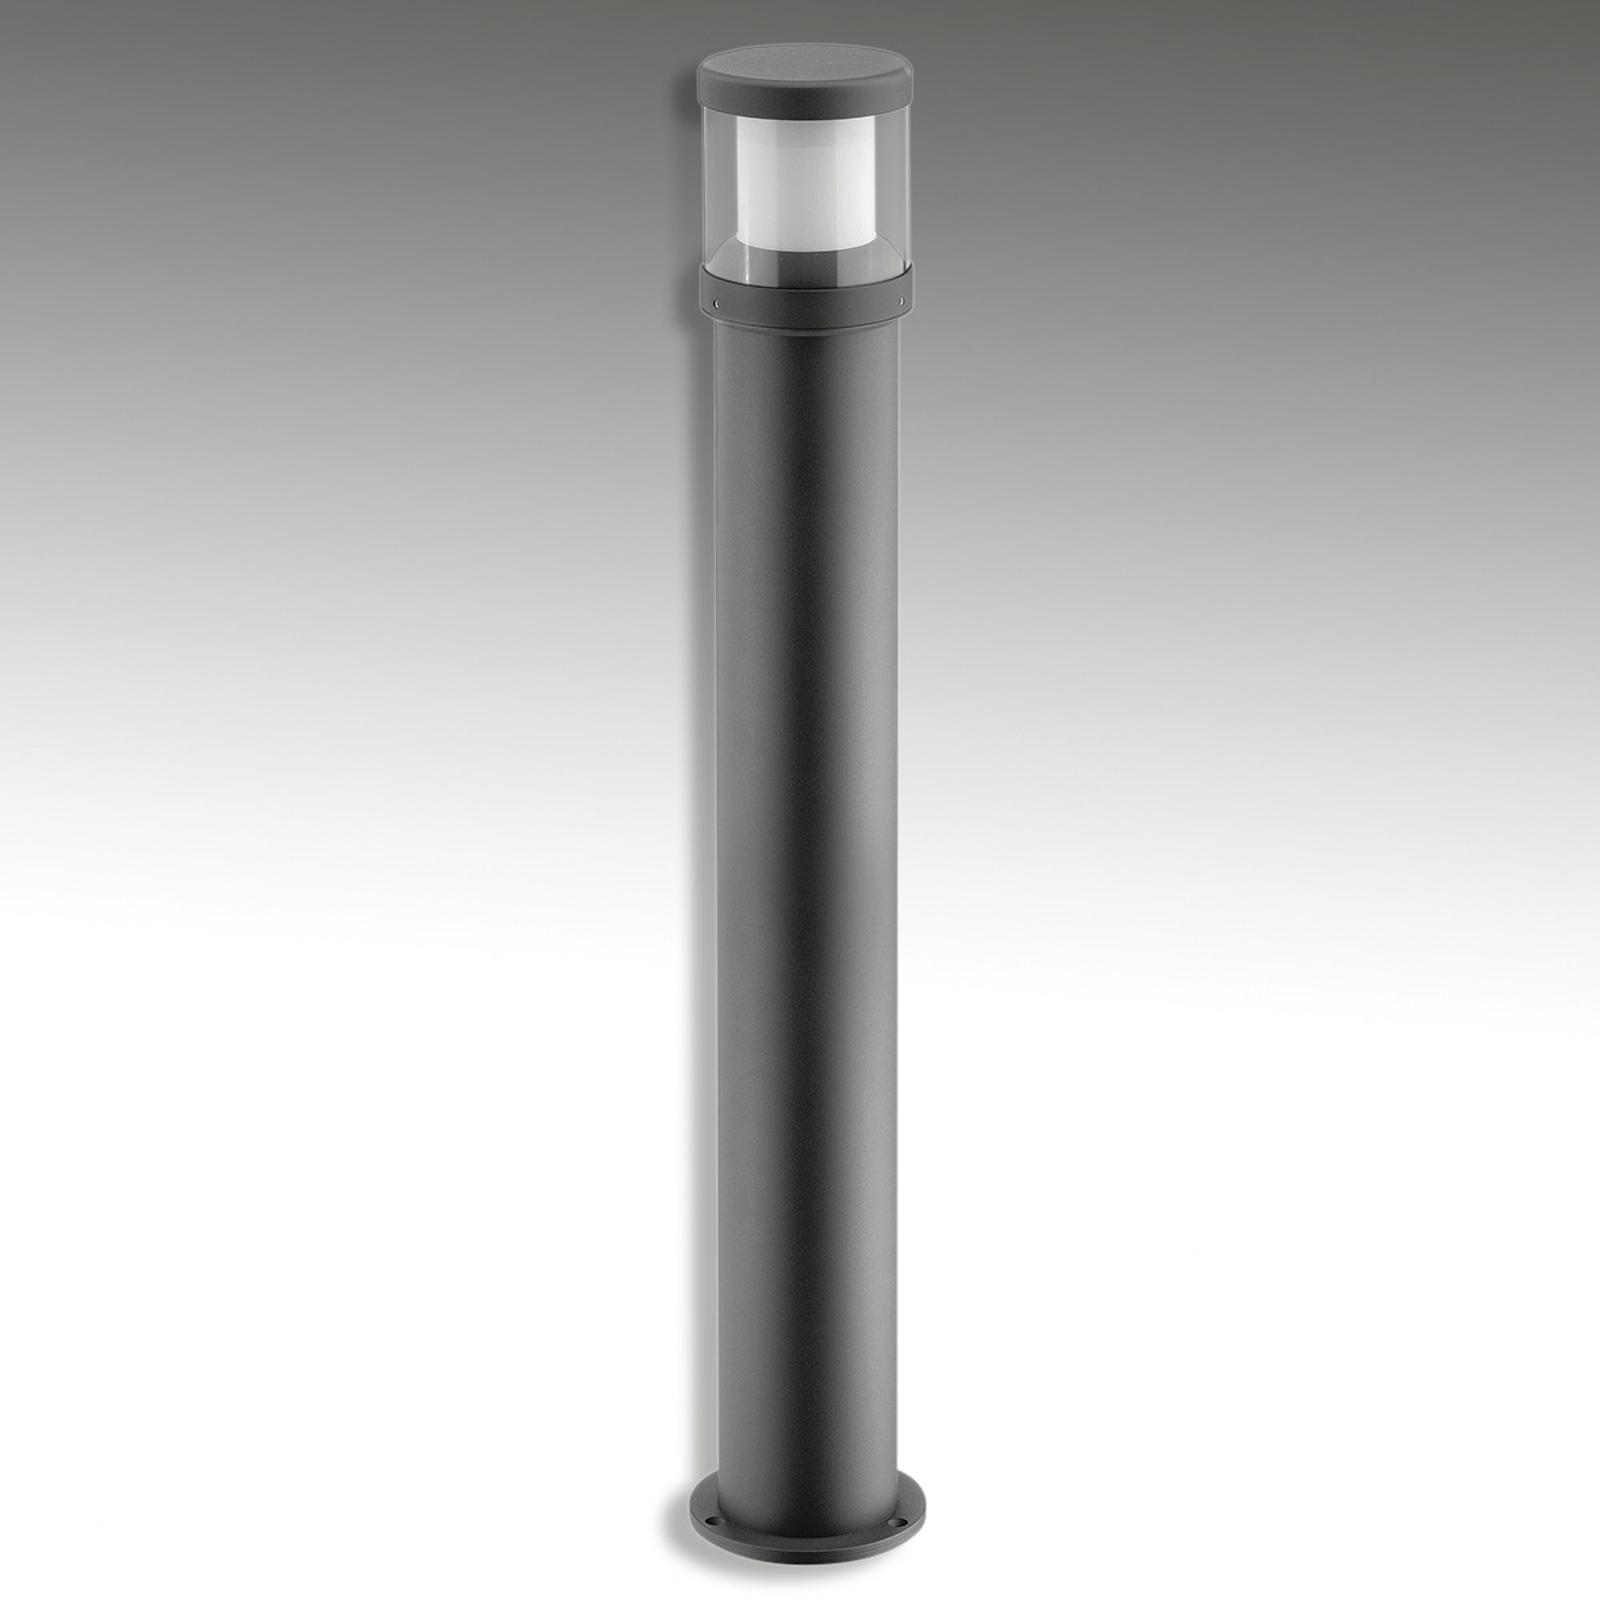 LED-pylväsvalaisin Levent, grafiitti 92 cm